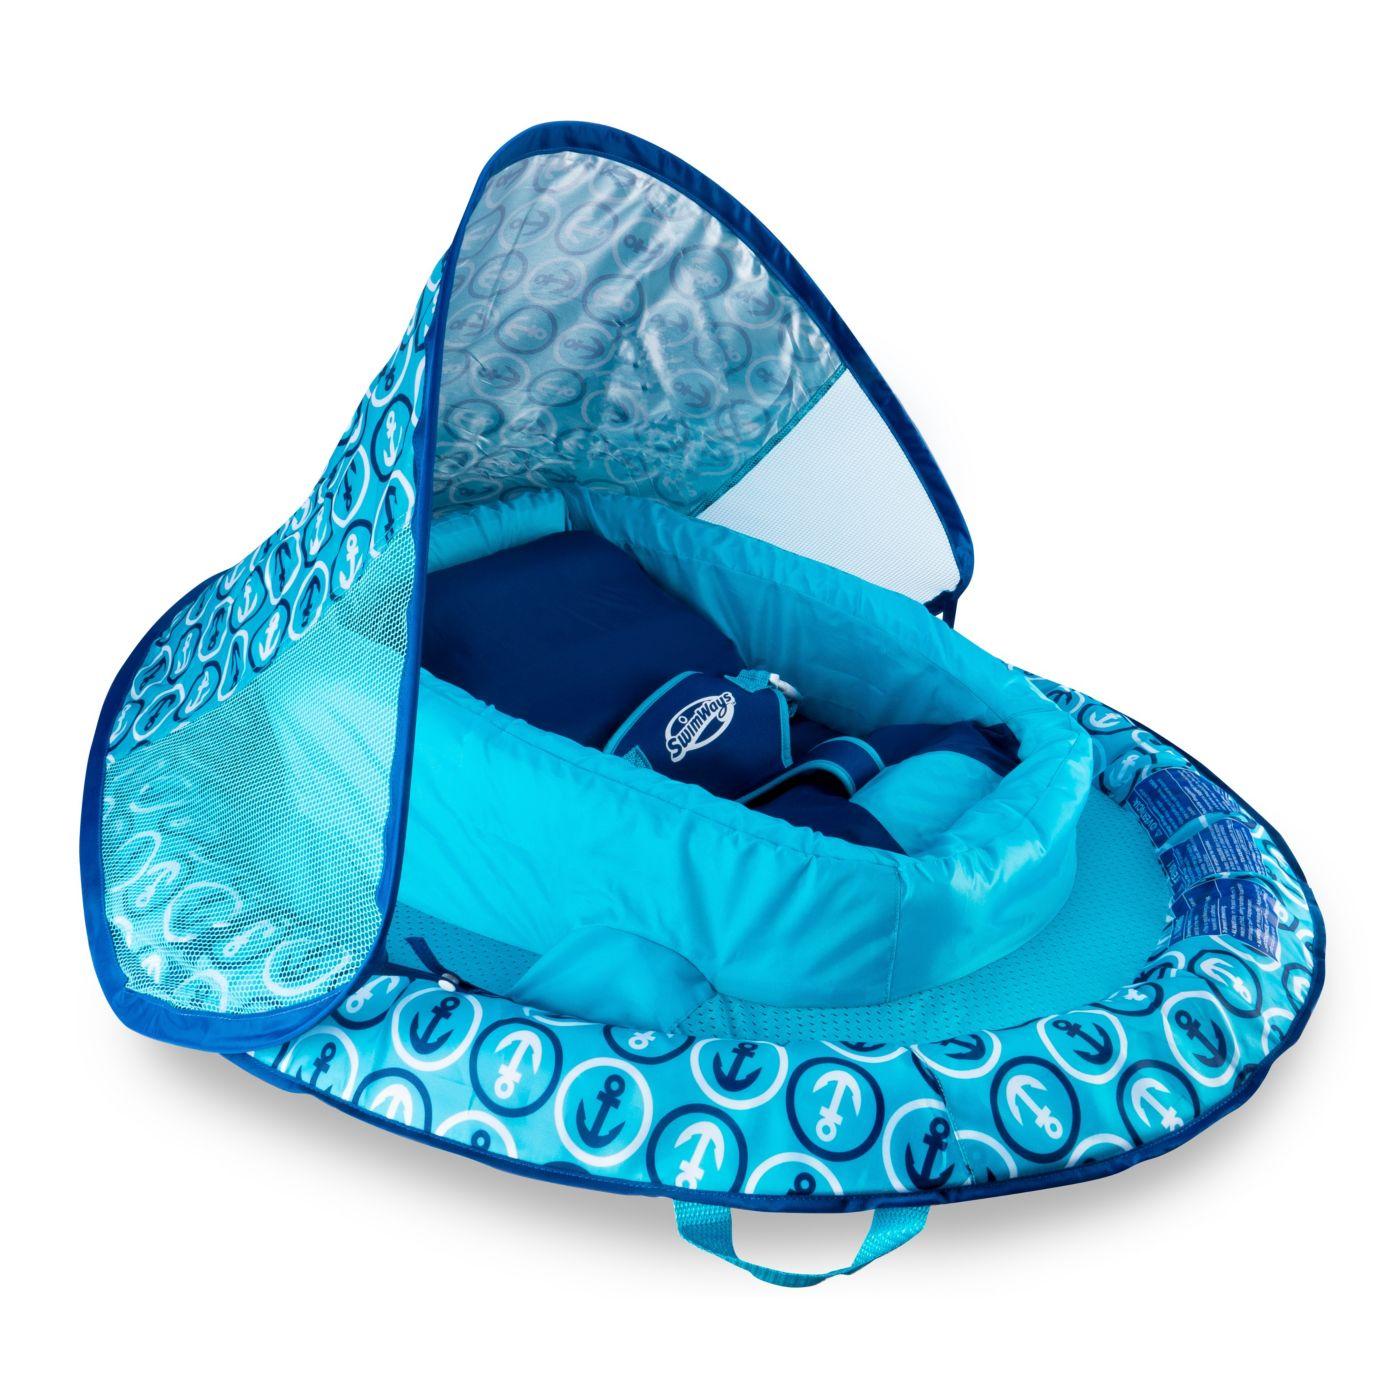 SwimWays Infant Baby Spring Float – Blue Anchor